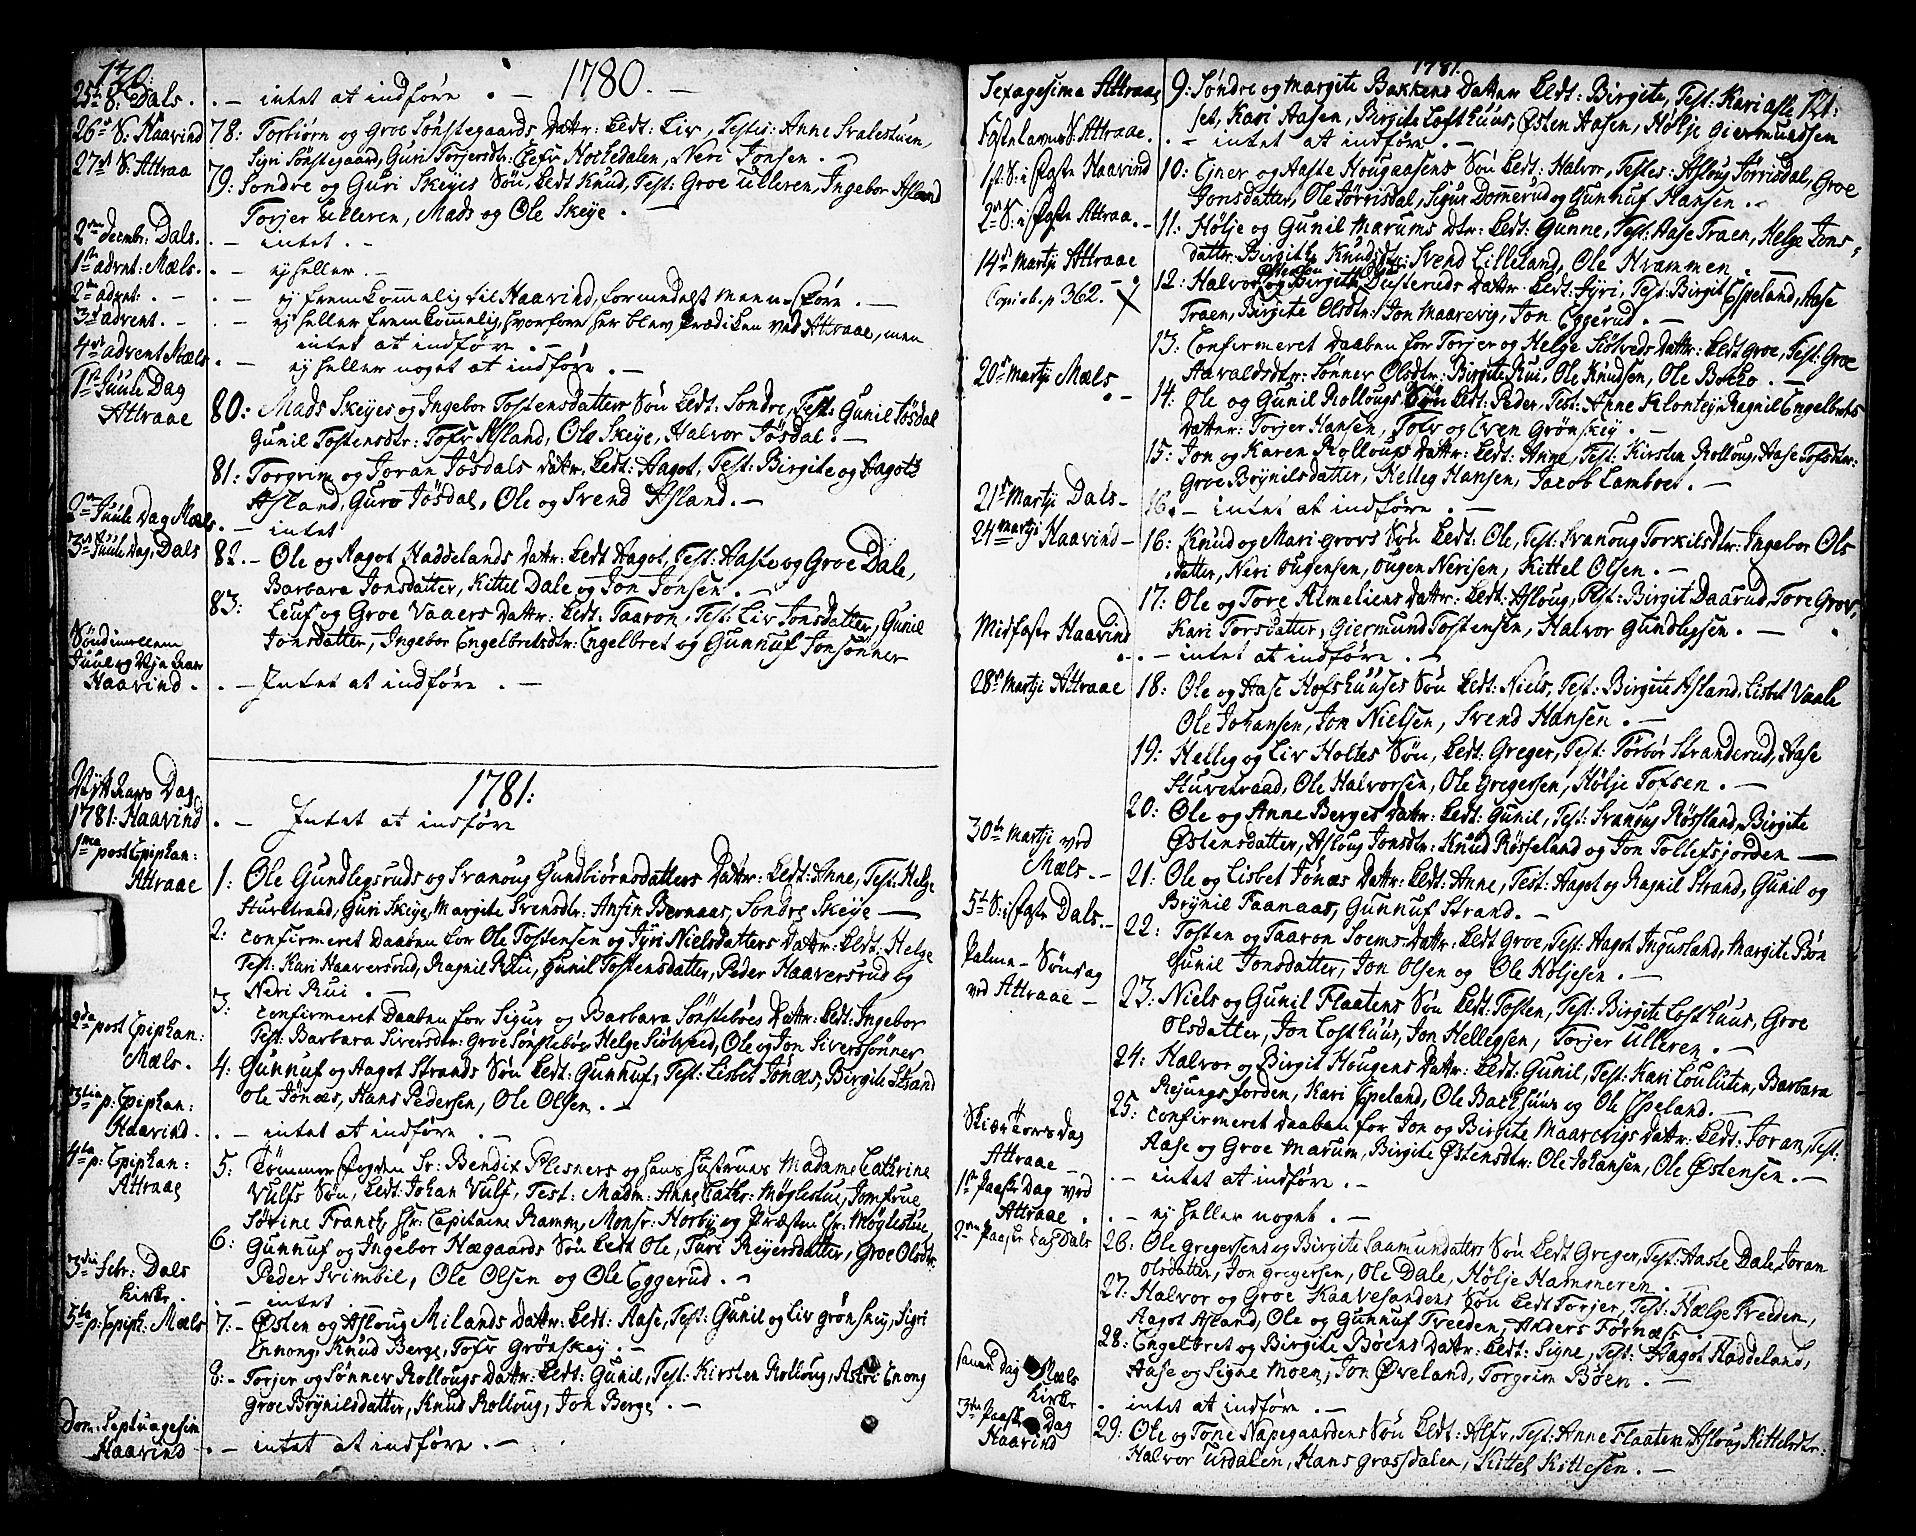 SAKO, Tinn kirkebøker, F/Fa/L0002: Ministerialbok nr. I 2, 1757-1810, s. 120-121